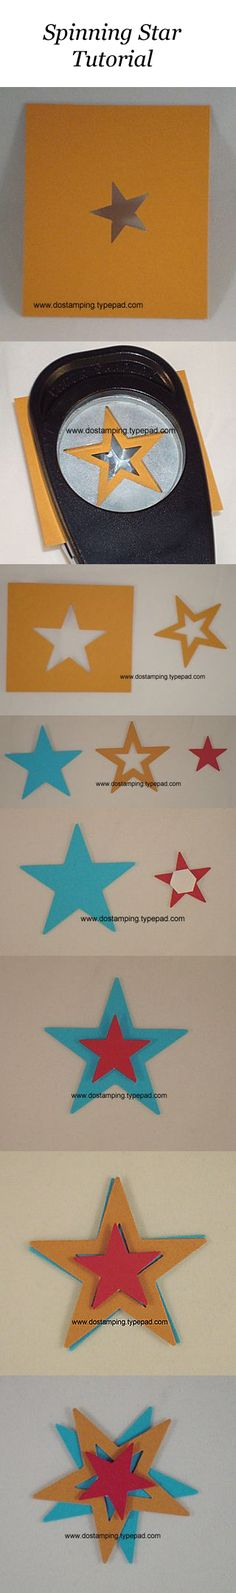 dawn olchefske, dostamping, spinning star tutorial, stampin up